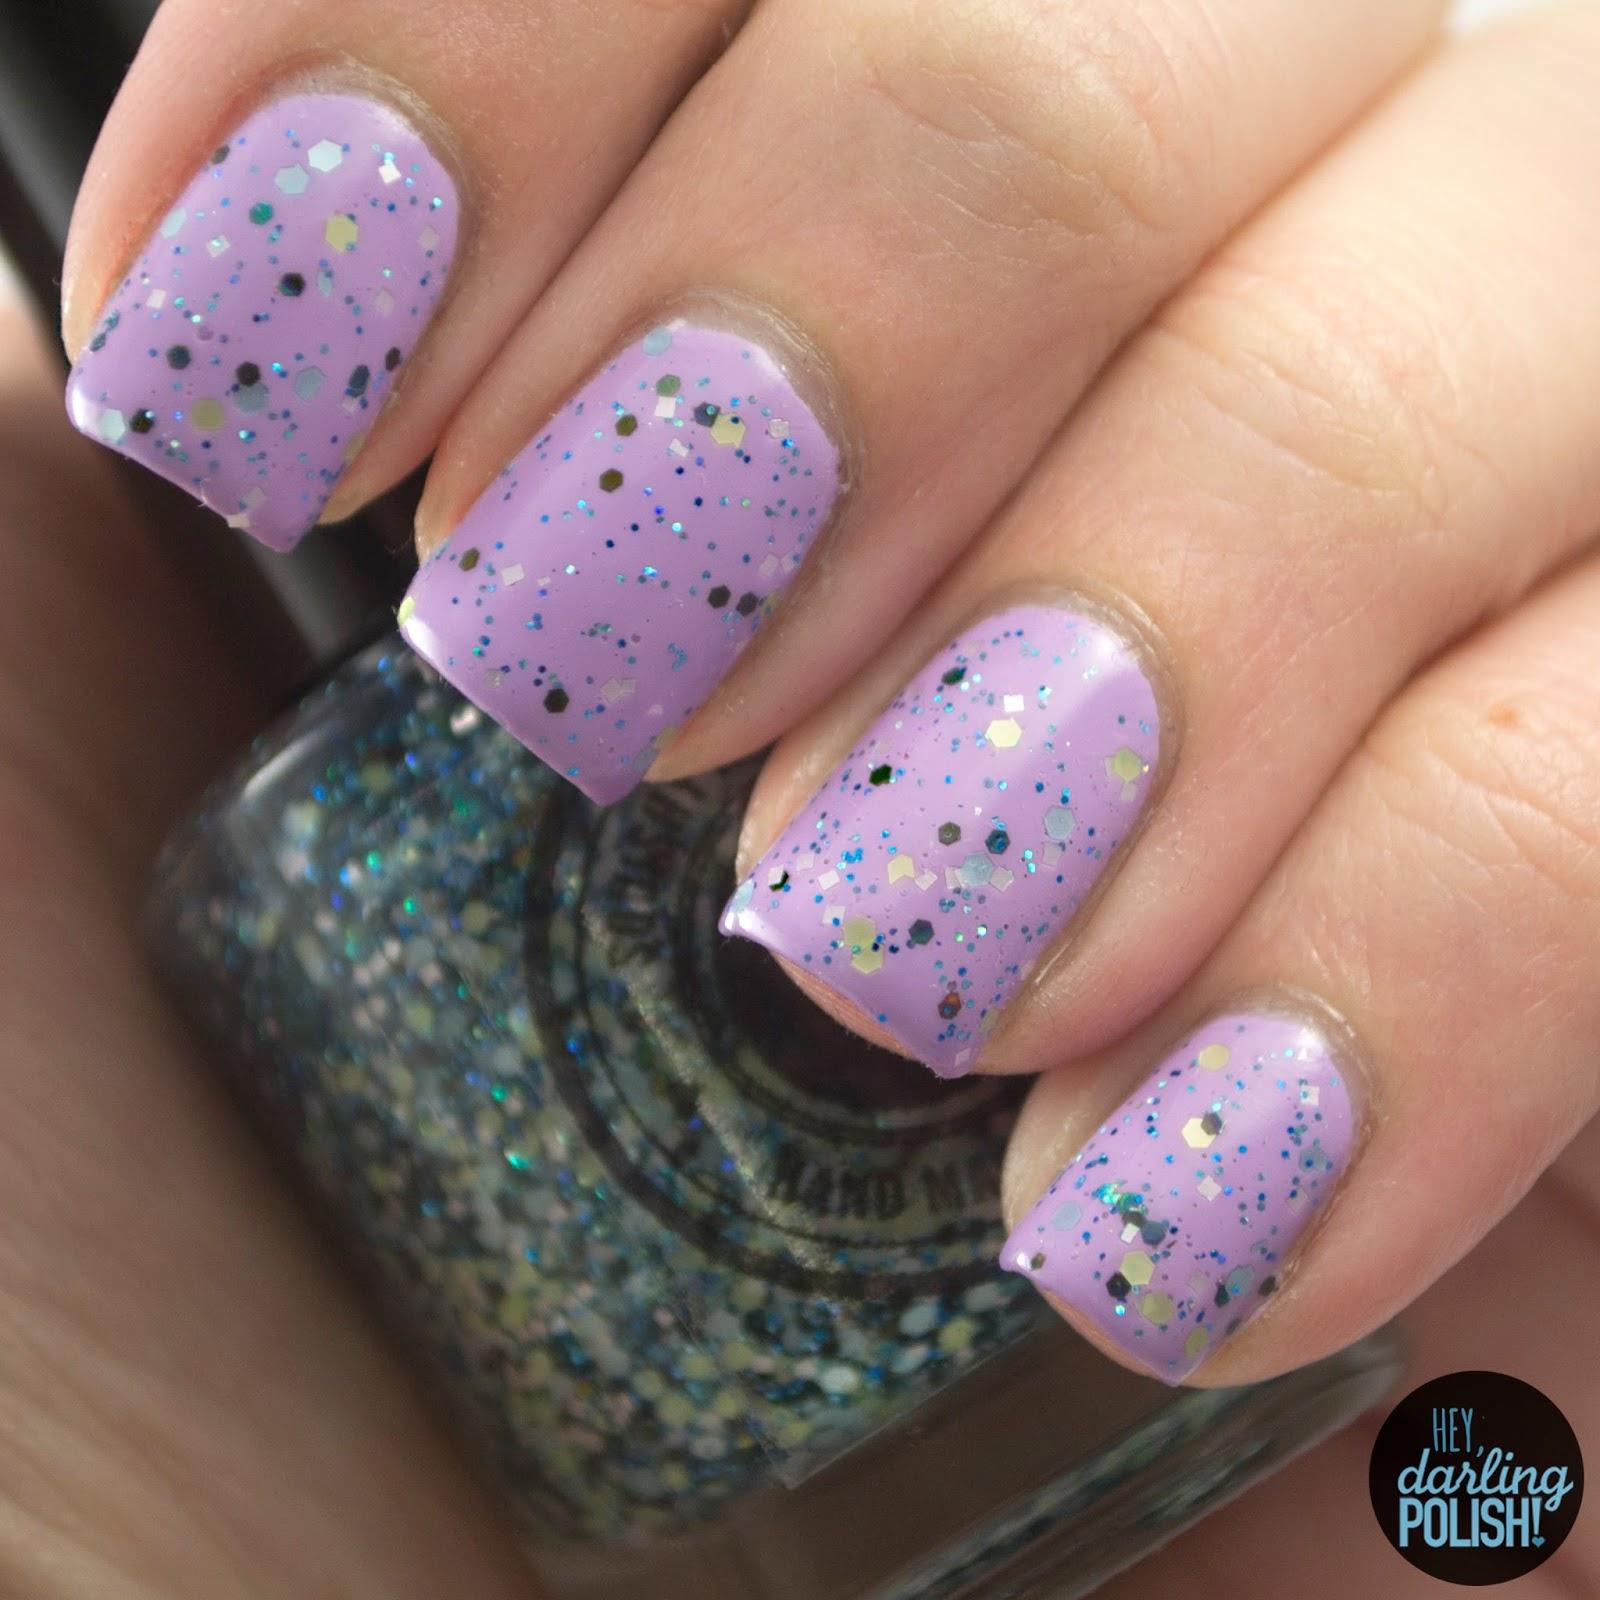 dragon princess, glitter, purple, nails, nail polish, indie, indie nail polish, indie polish, squishy face polish, hey darling polish, swatch